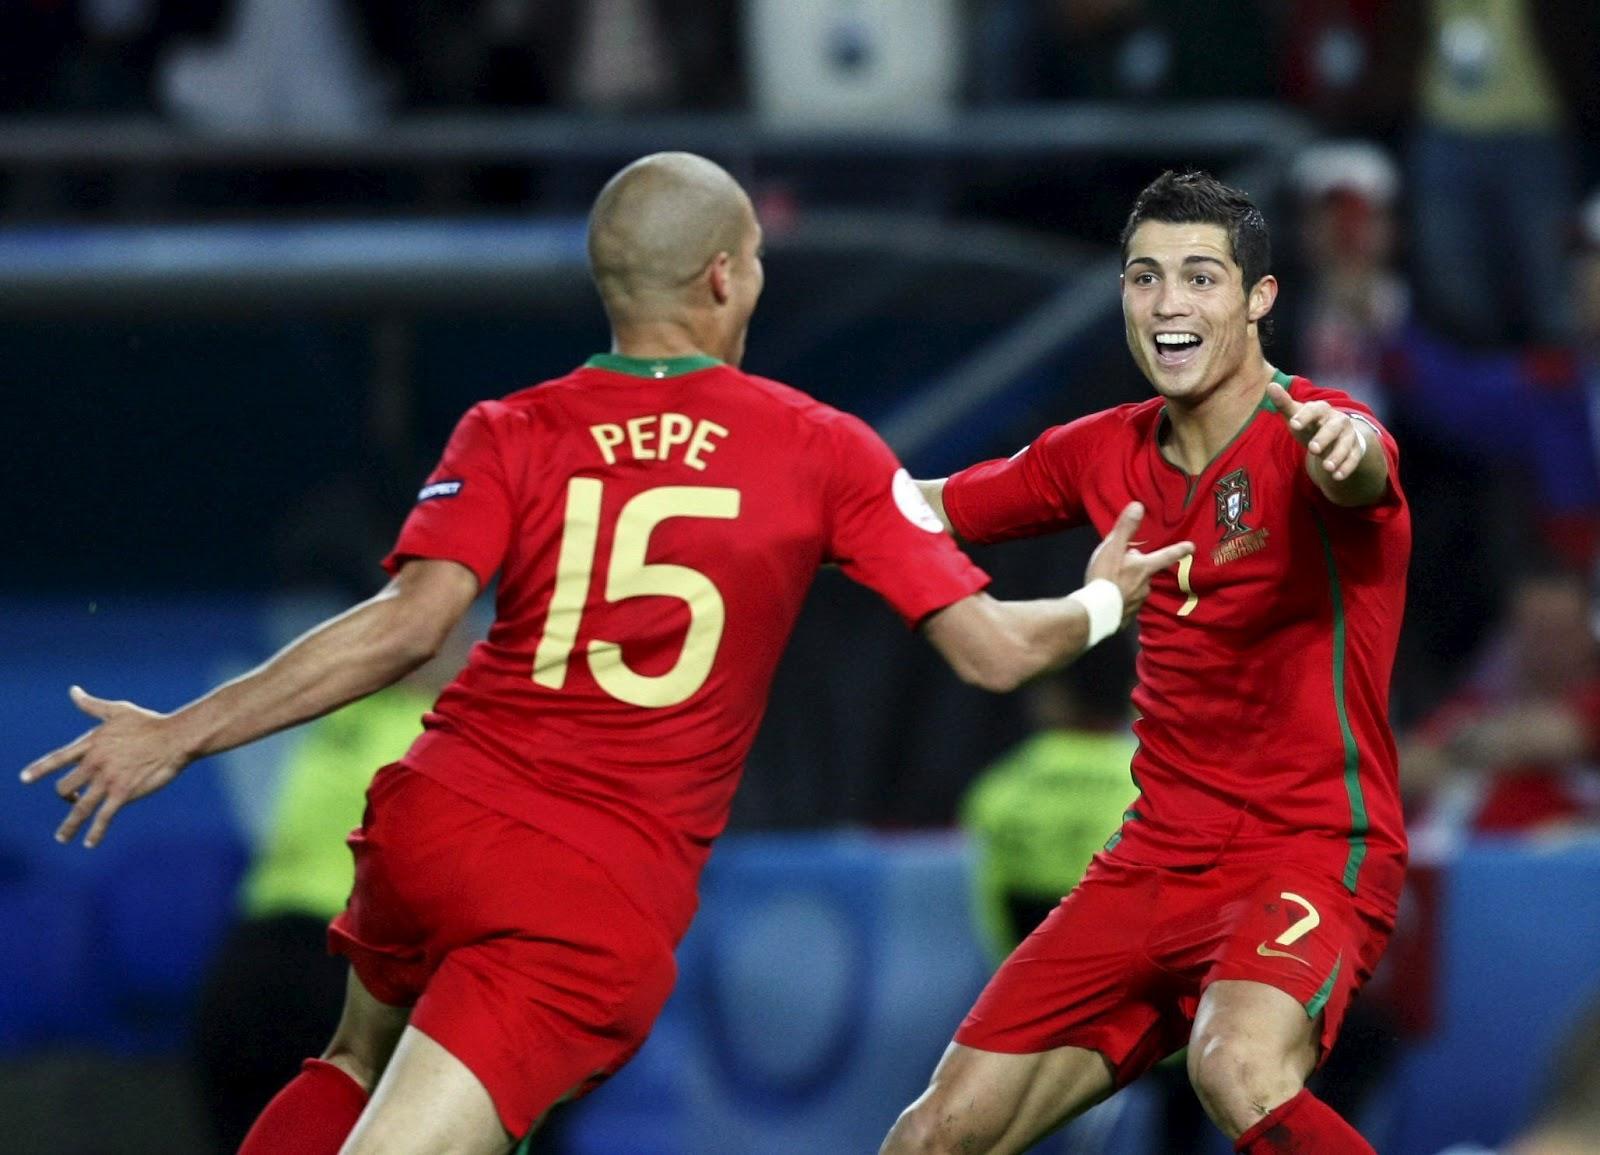 http://1.bp.blogspot.com/-mZGKQ8Z32Cg/T6Z31UnZStI/AAAAAAAAByI/LN9j9115S50/s1600/C-Ronaldo+05.jpg